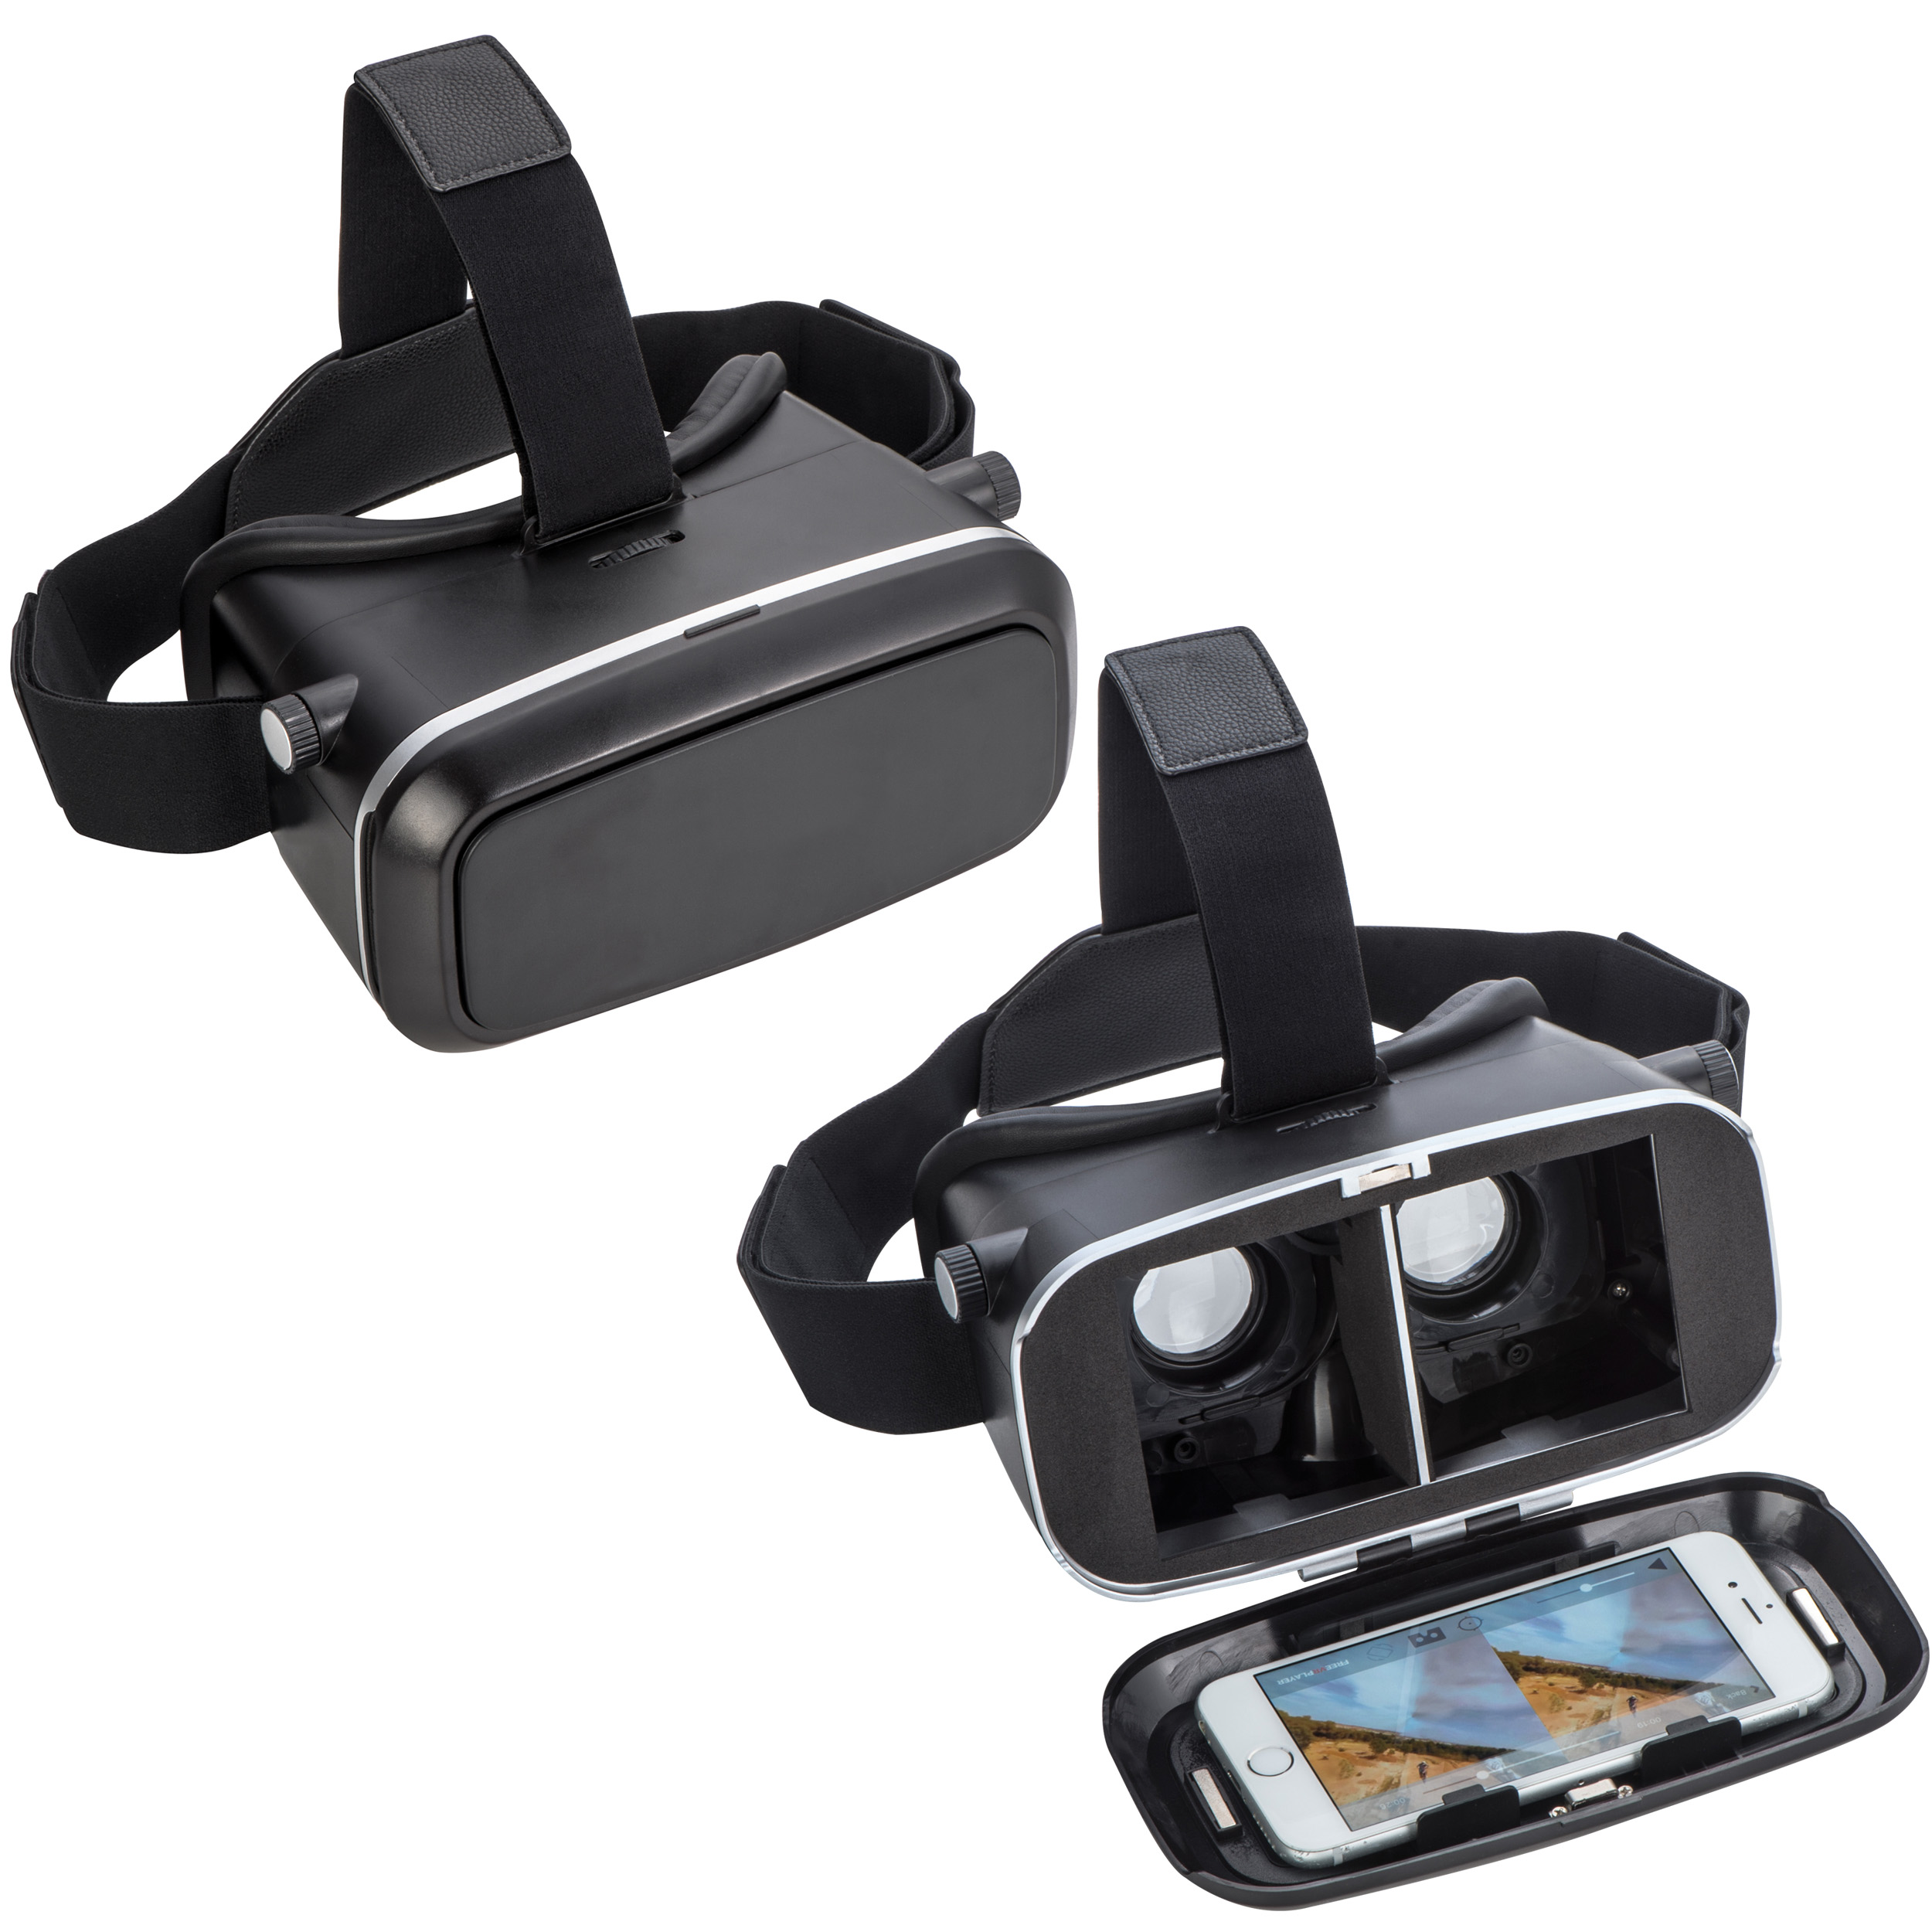 Virtual Reality glasses made of PVC